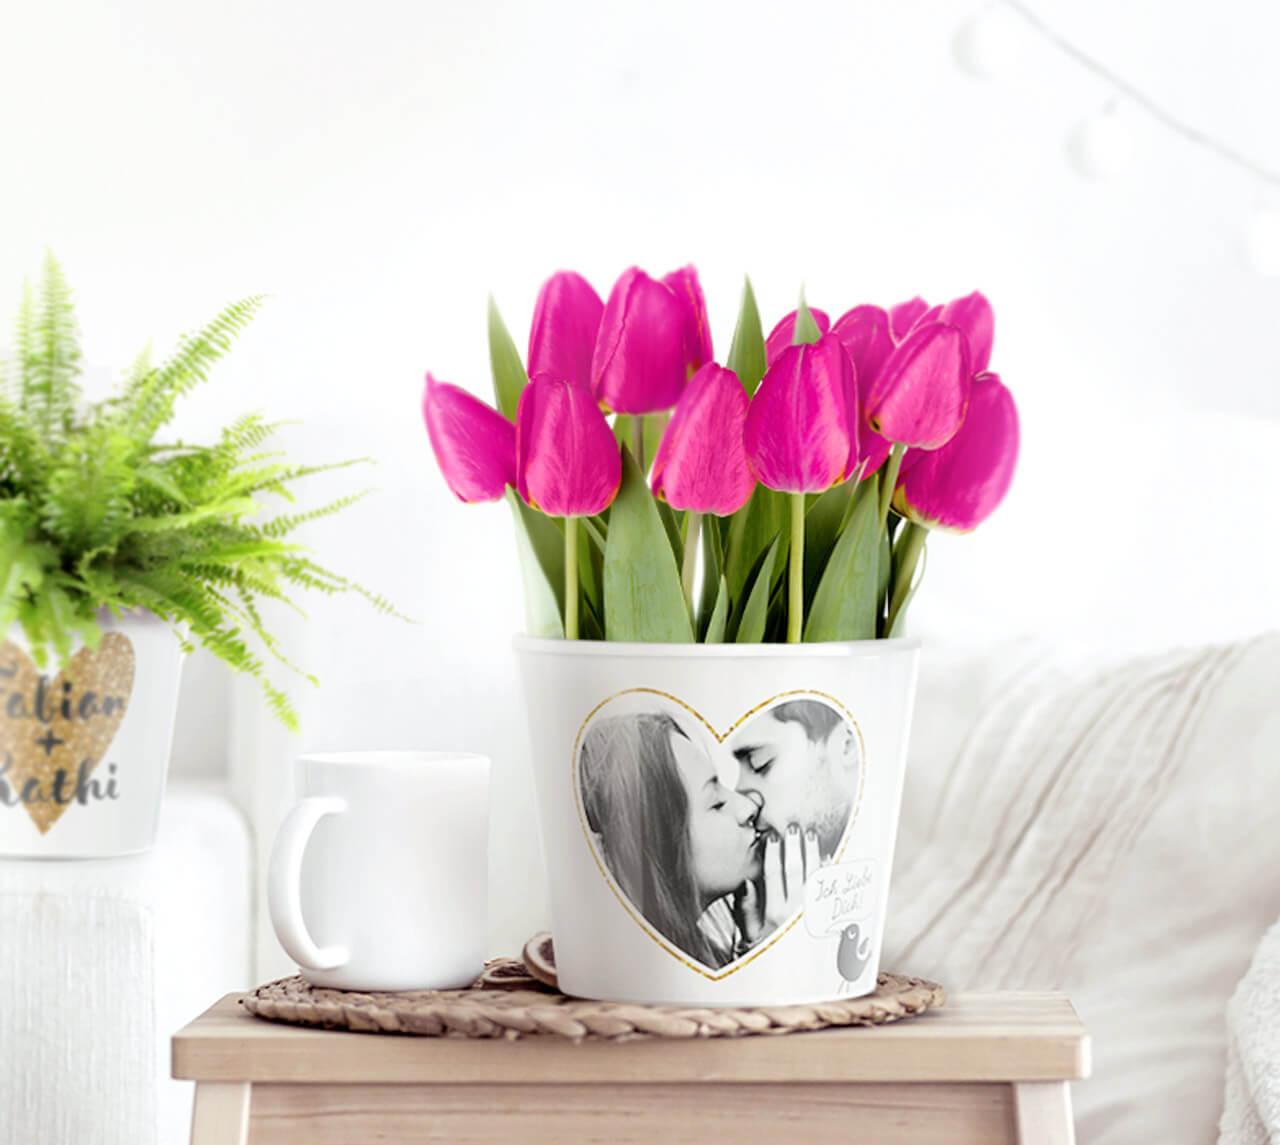 Myfacepot blumentopf mit foto als geschenk deko for Blumentopf deko